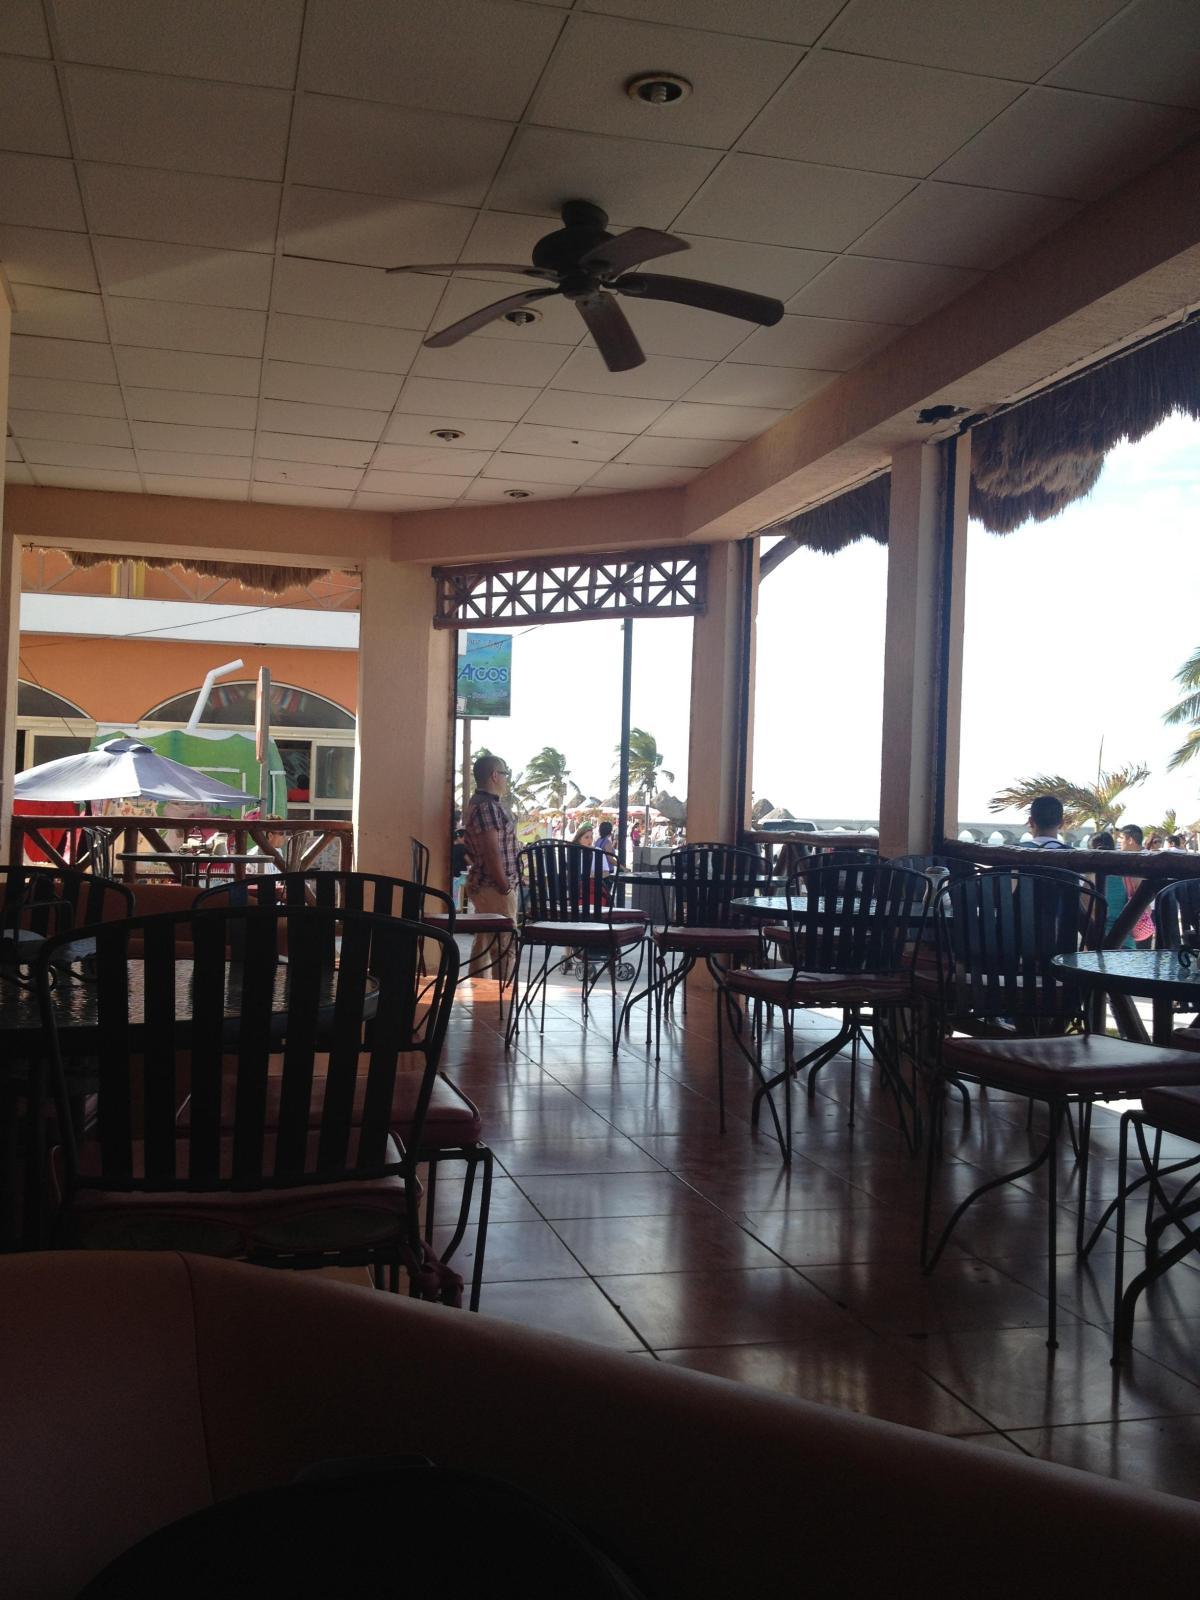 The Progreso, Yucatan Vacation Rental Part II — By Jennifer Shipp